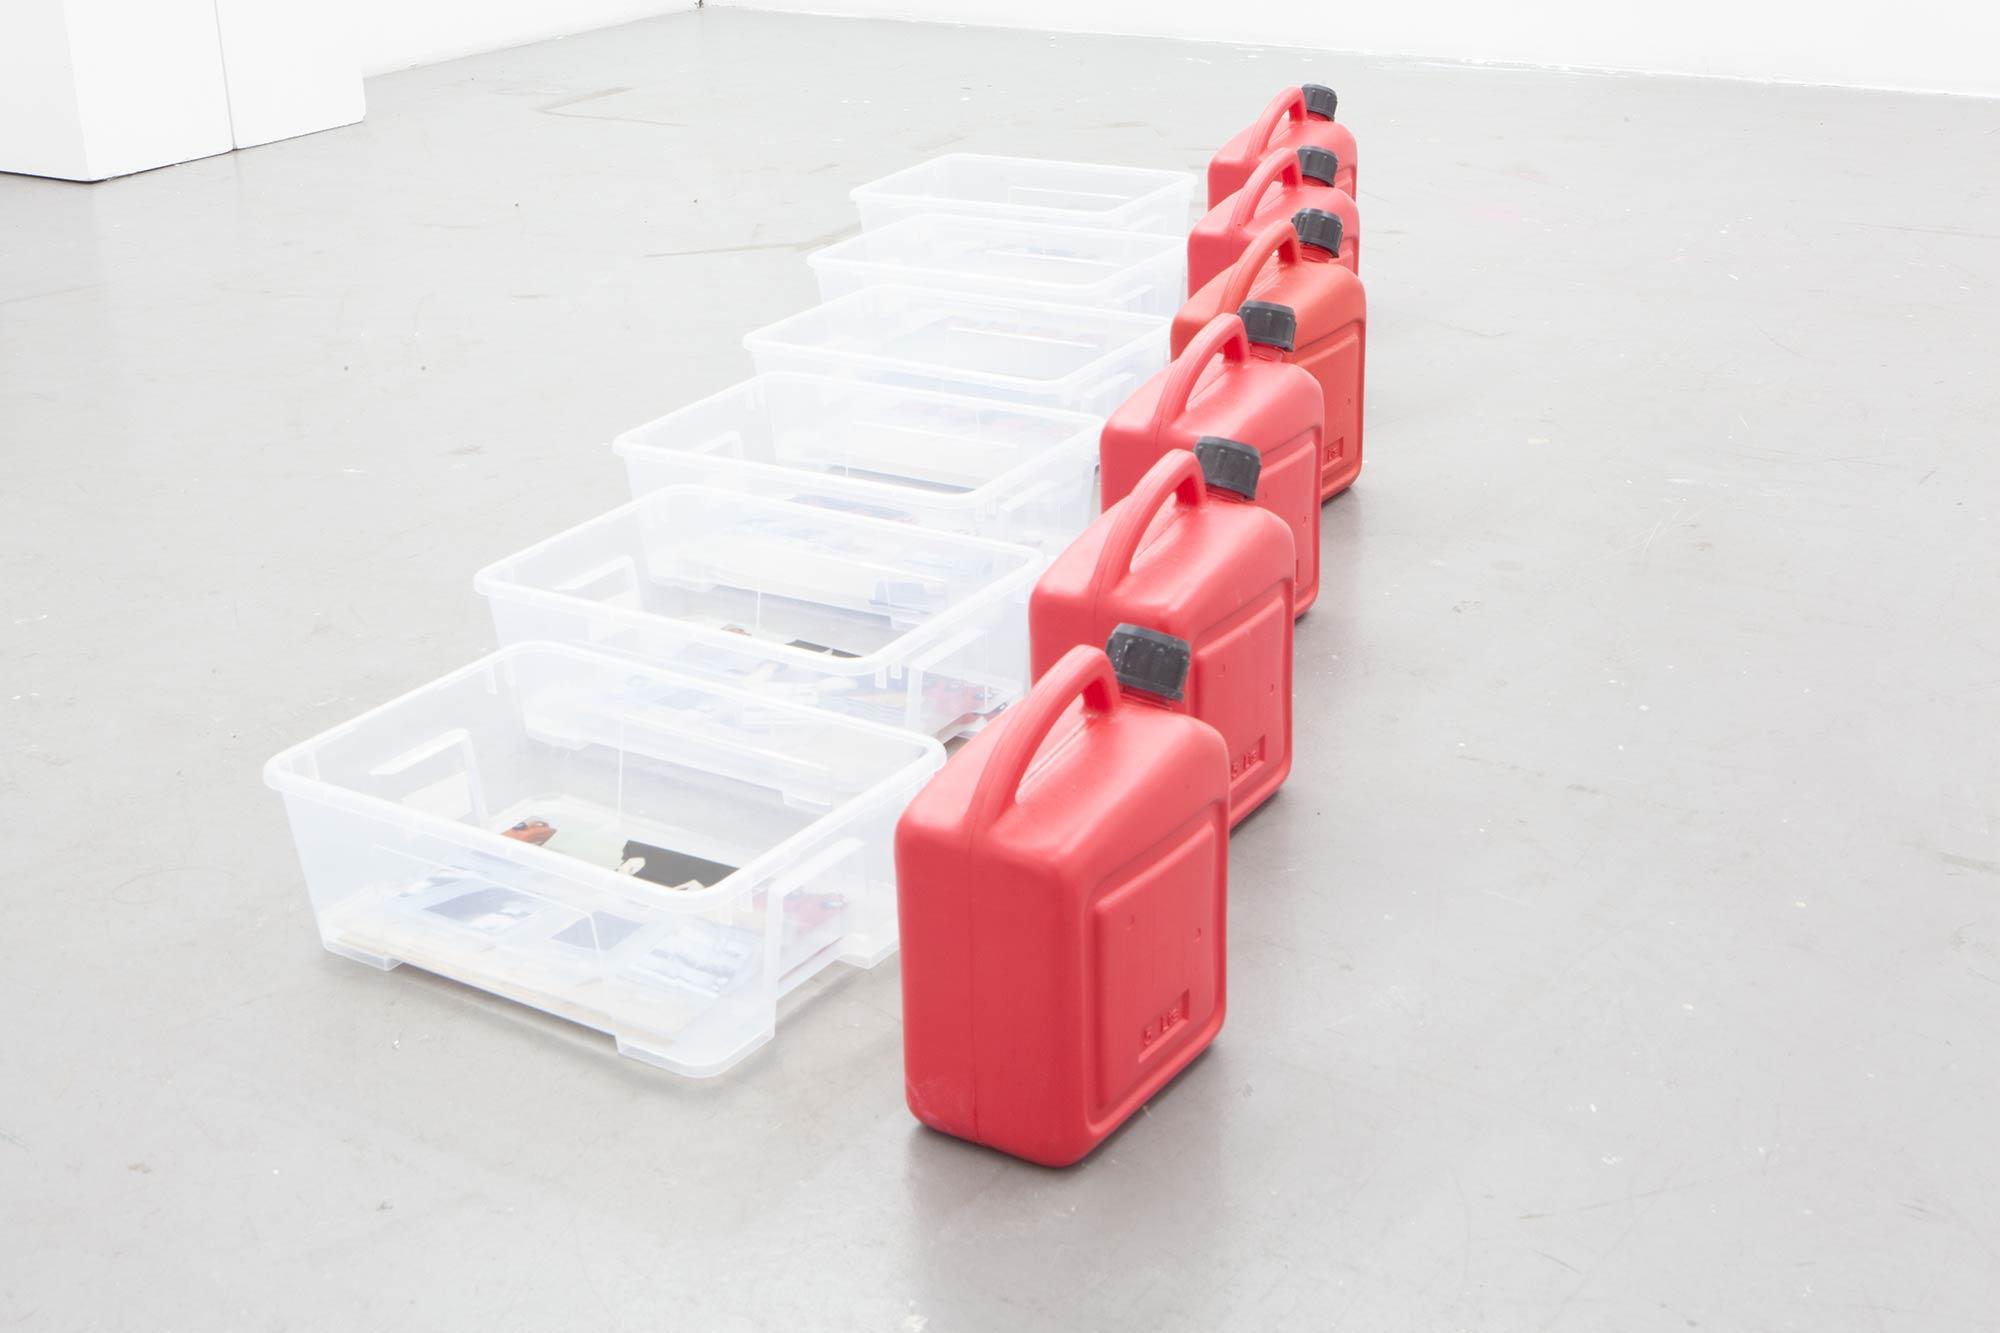 msdm-trabalhos-liquidos-13